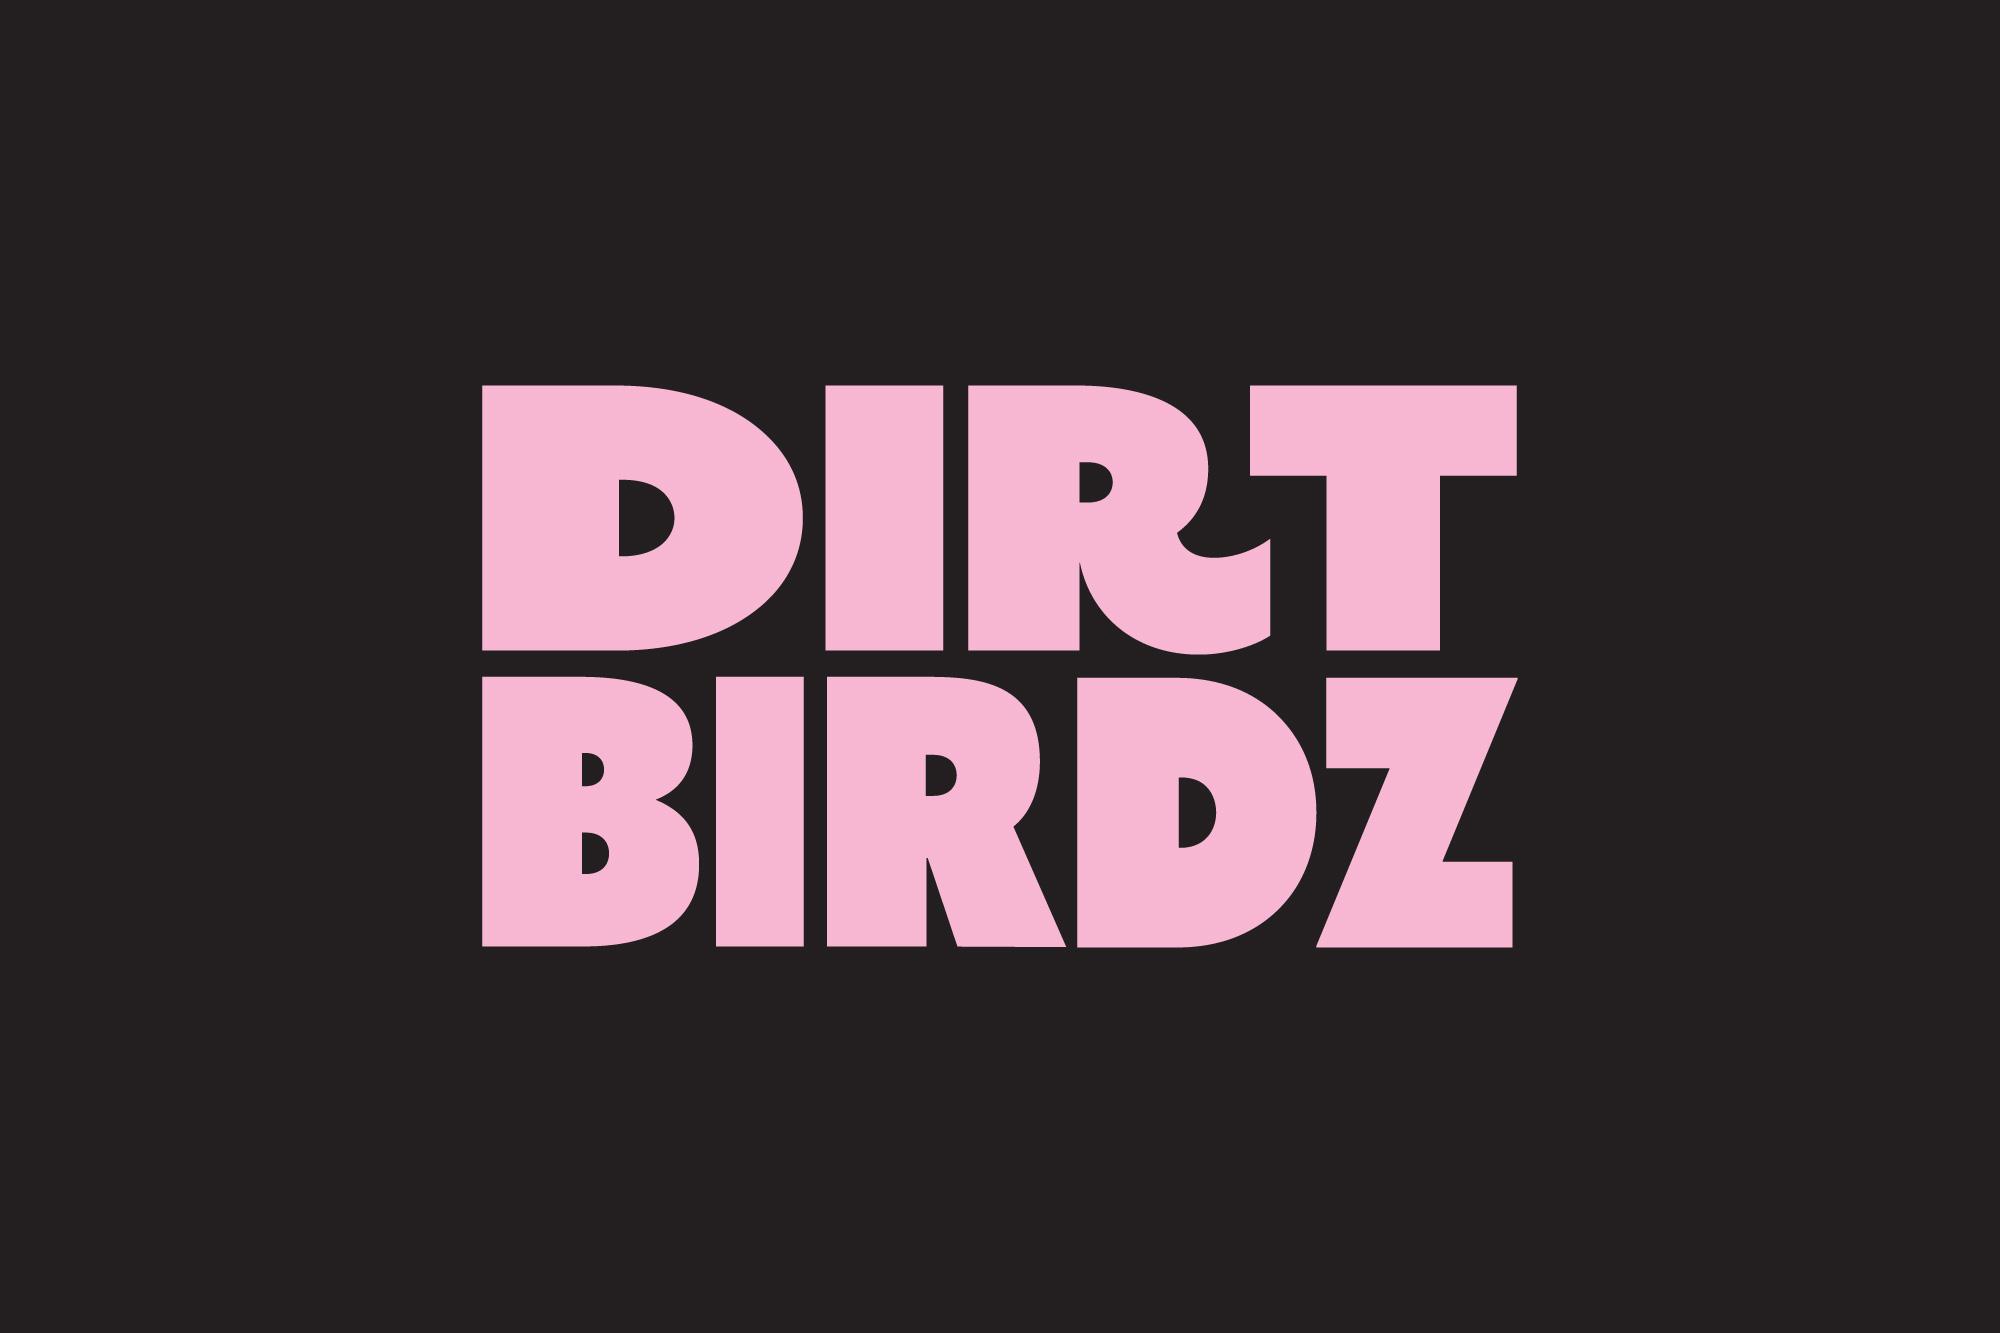 Cover image: Dirt Birdz - Identity